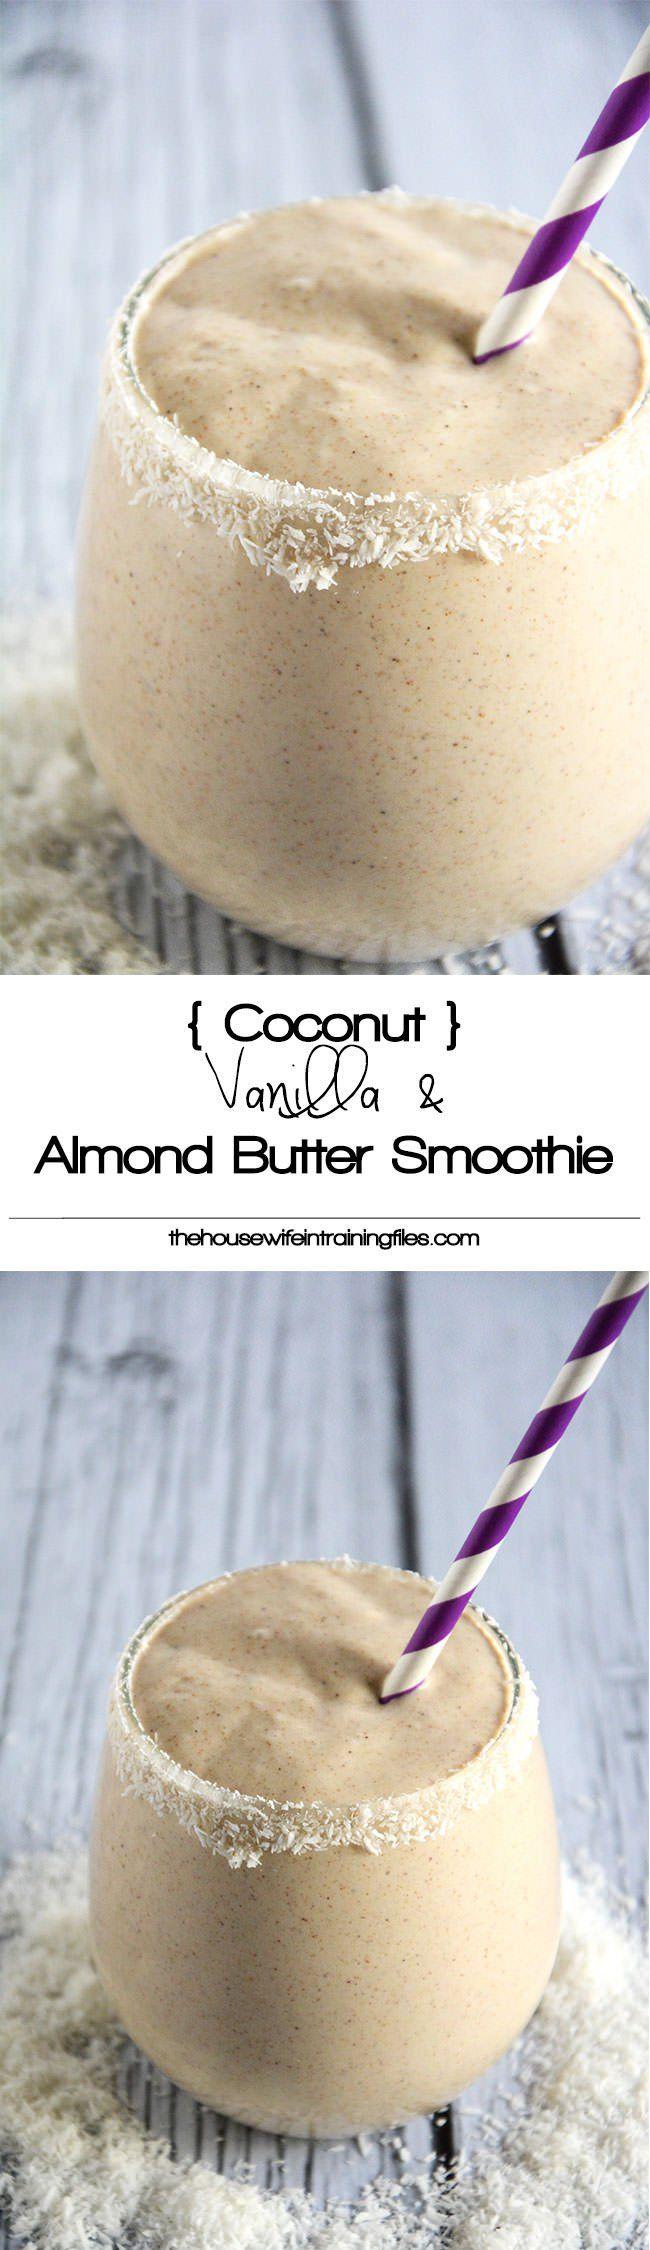 Paleo Coconut, Vanilla & Almond Butter Smoothie Recipe